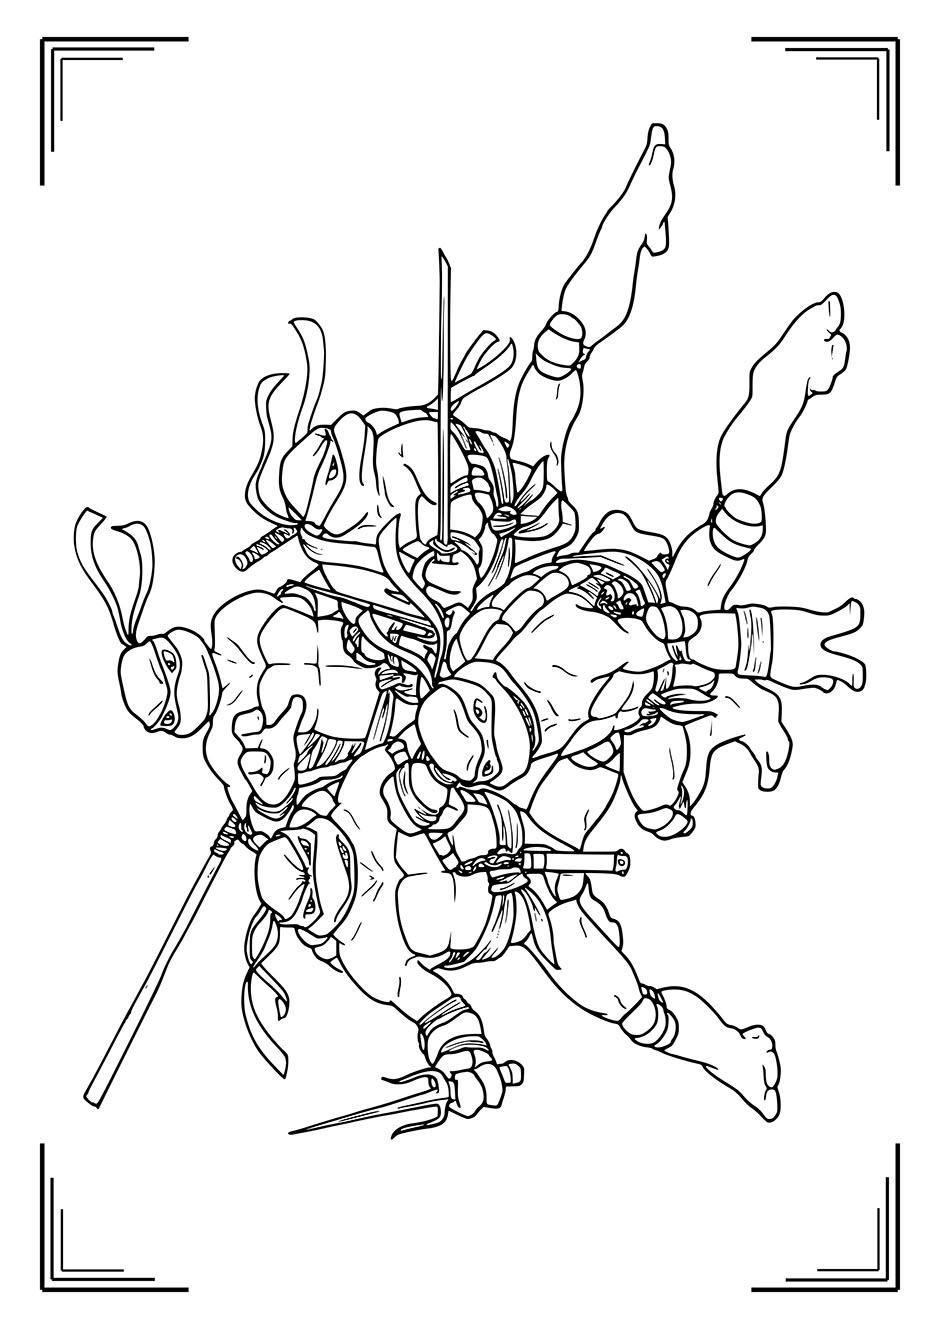 Раскраска: черепашки ниндзя вместе — raskraski-a4.ru